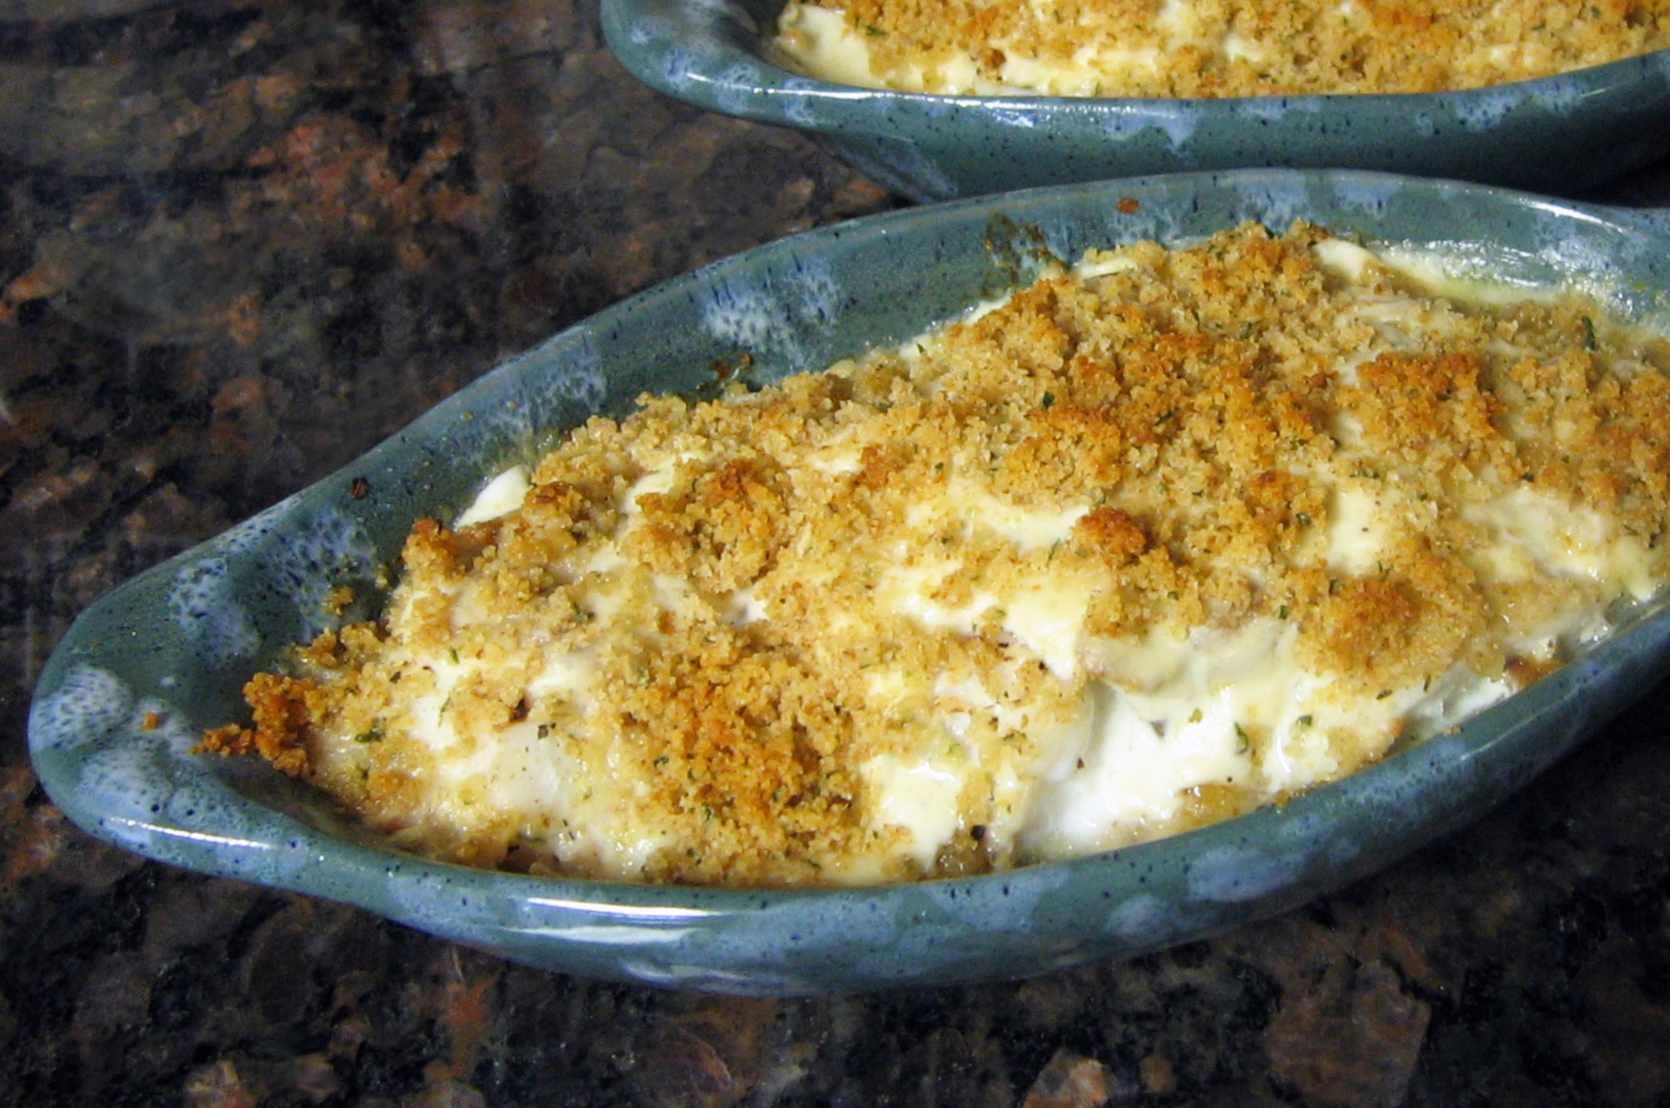 Baked haddock with mushroom cream sauce